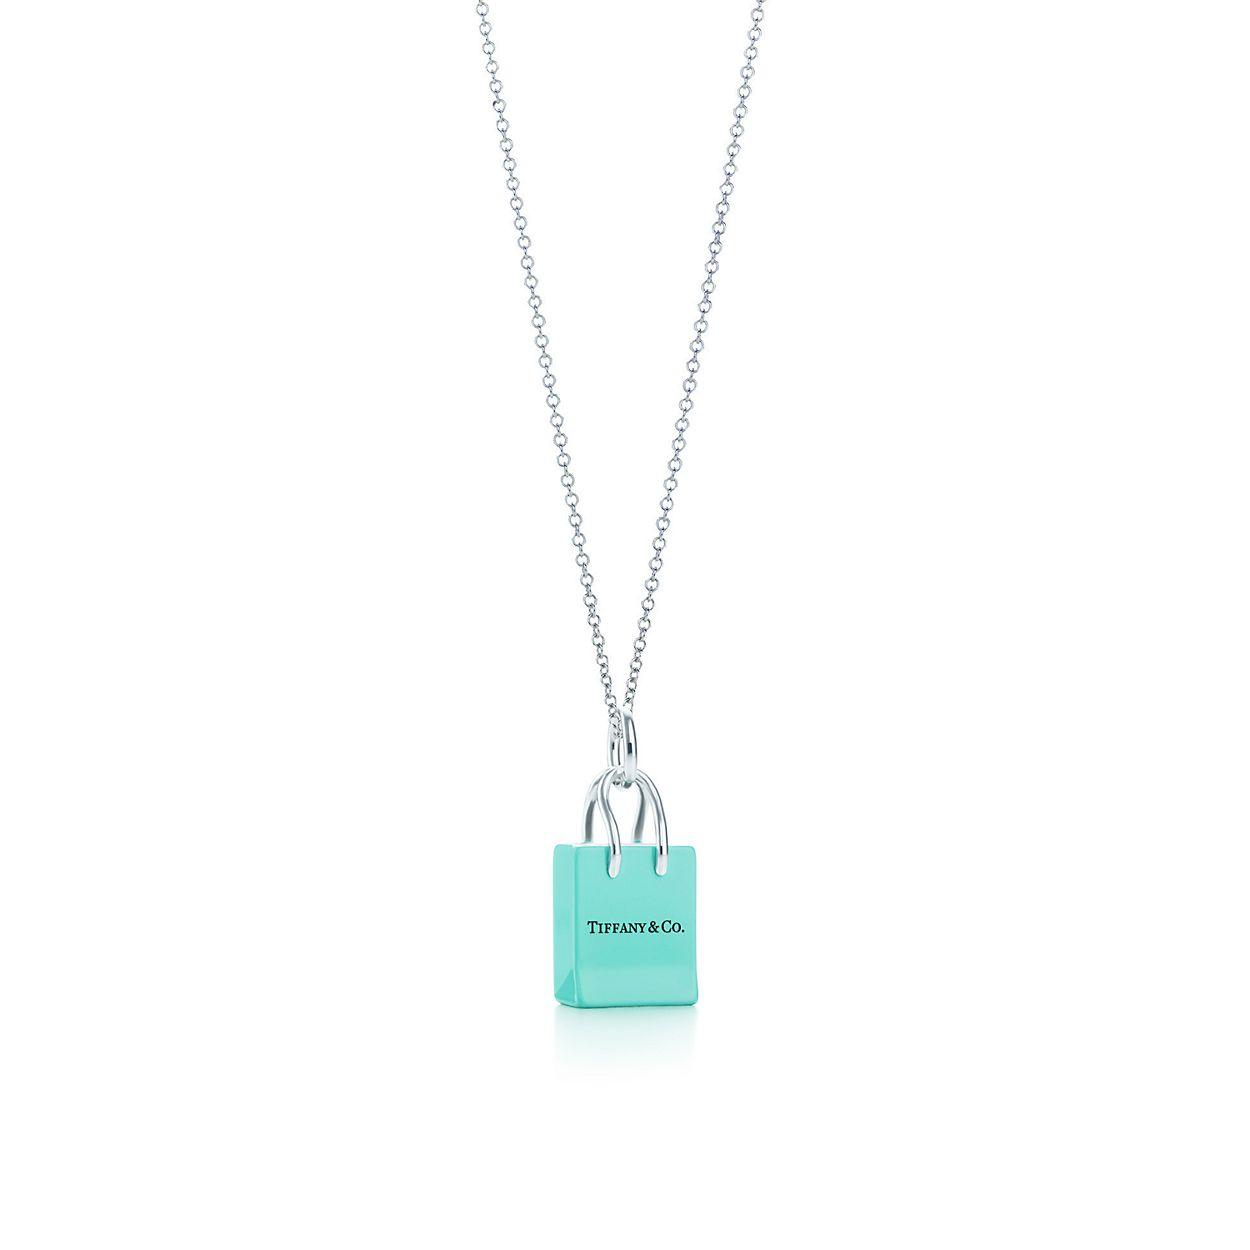 Handbag charm in sterling silver with Tiffany Blue enamel finish Tiffany & Co. XSdmGE